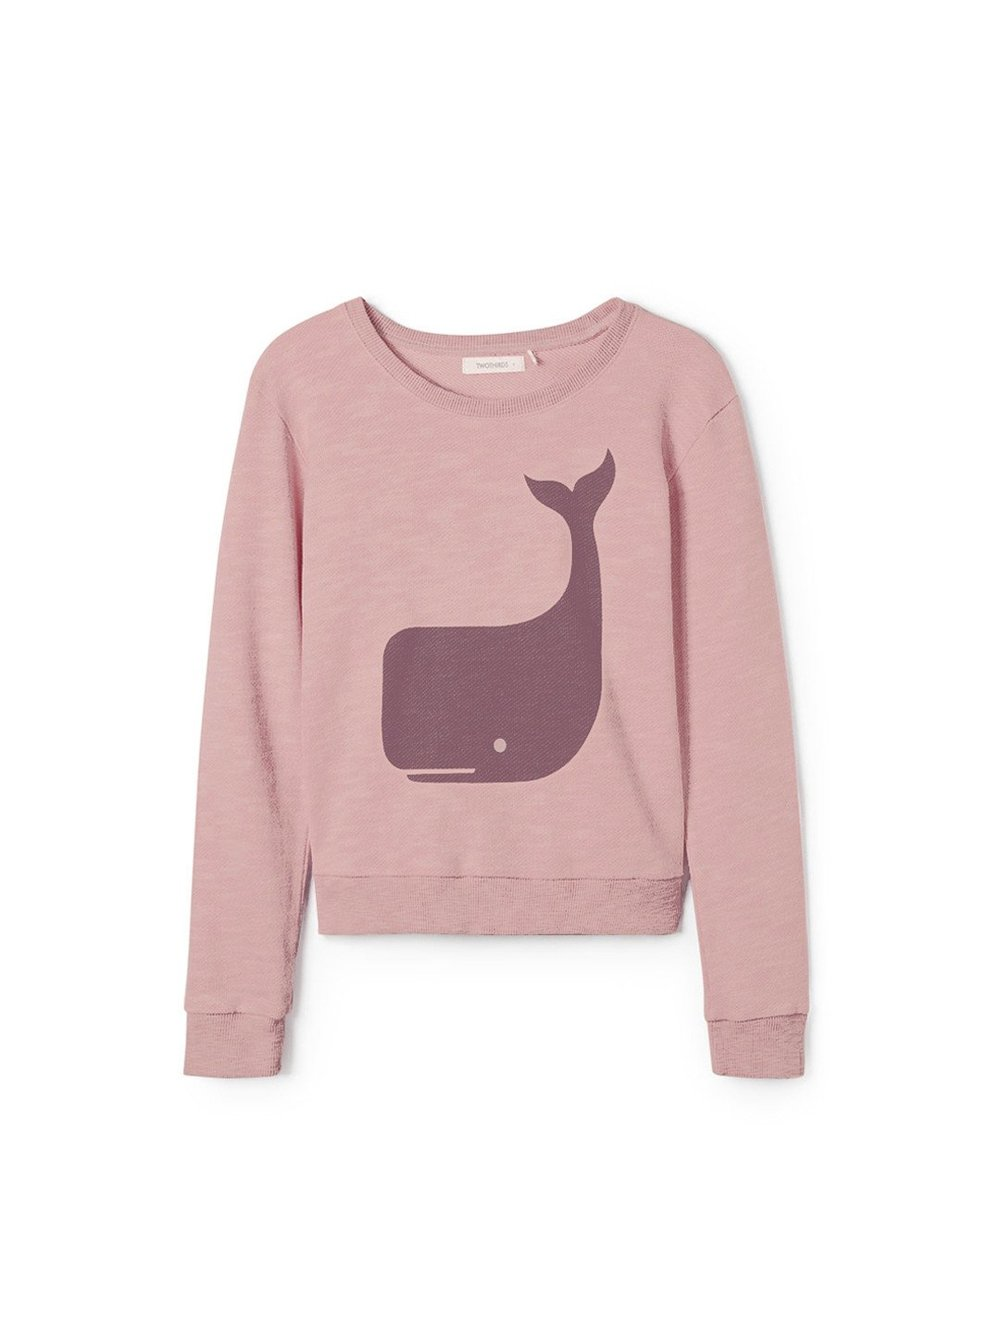 Hainan Sweatshirt - Pink